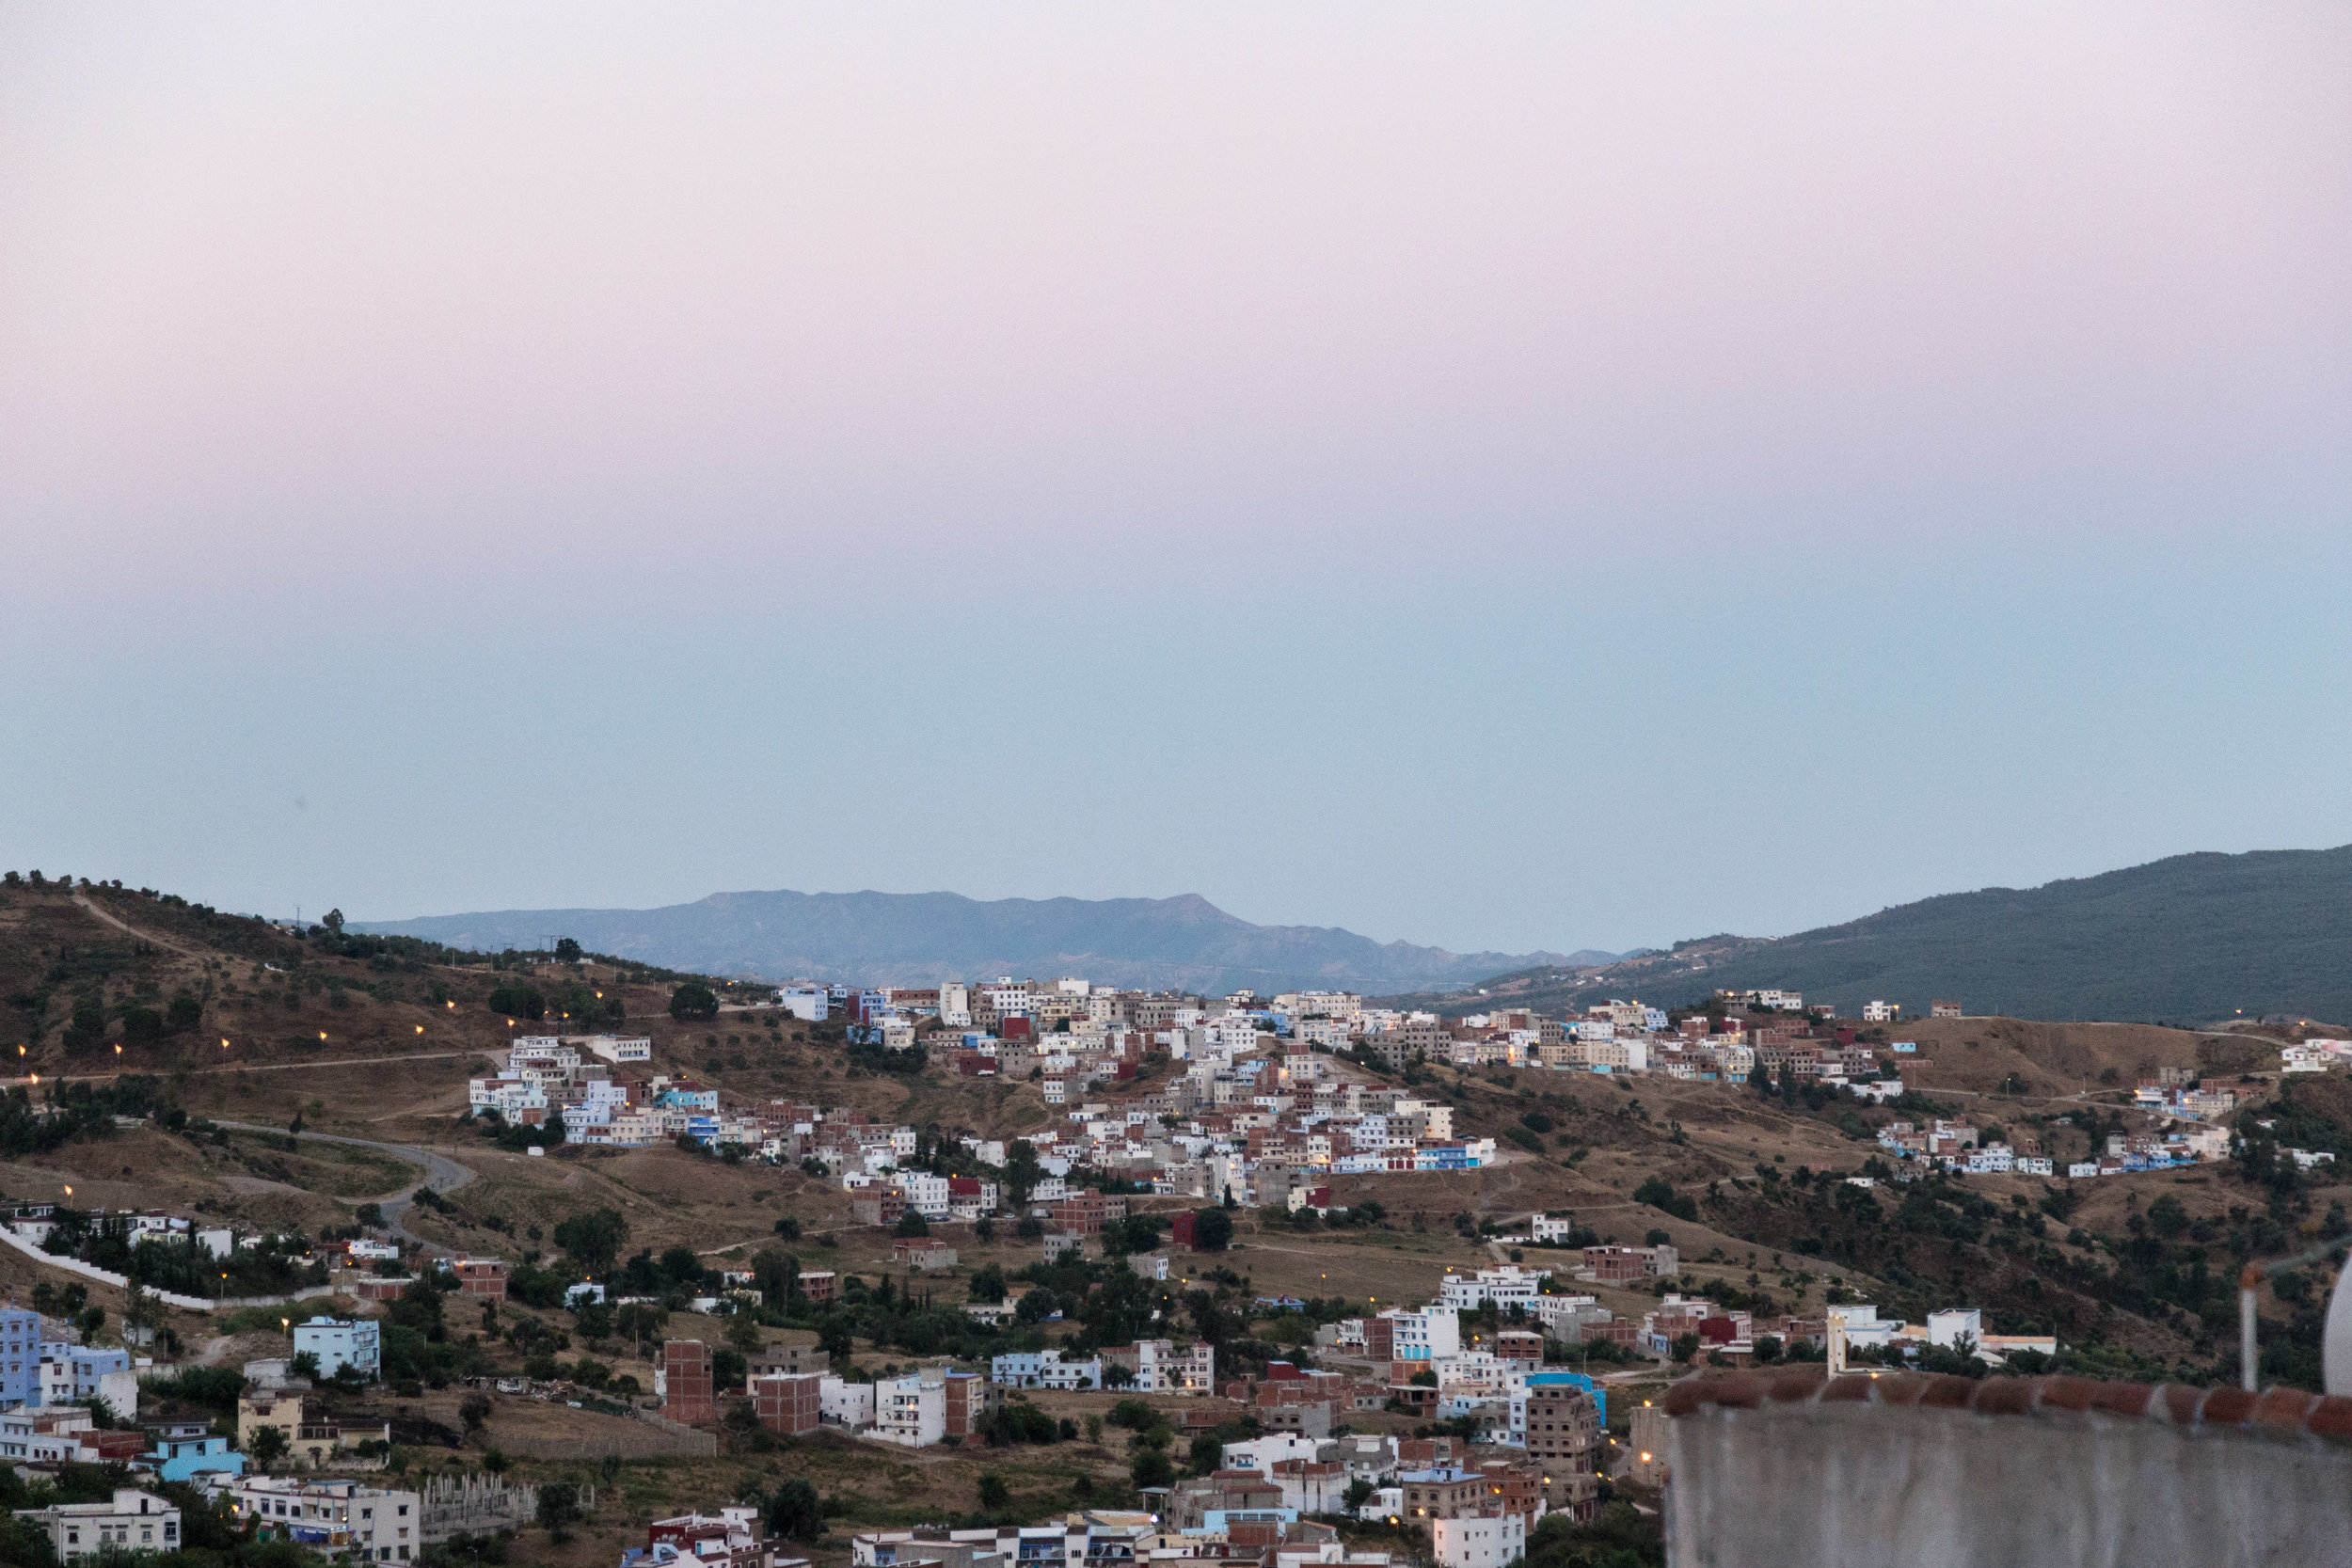 20170701_ebb_morocco_01_105.jpg